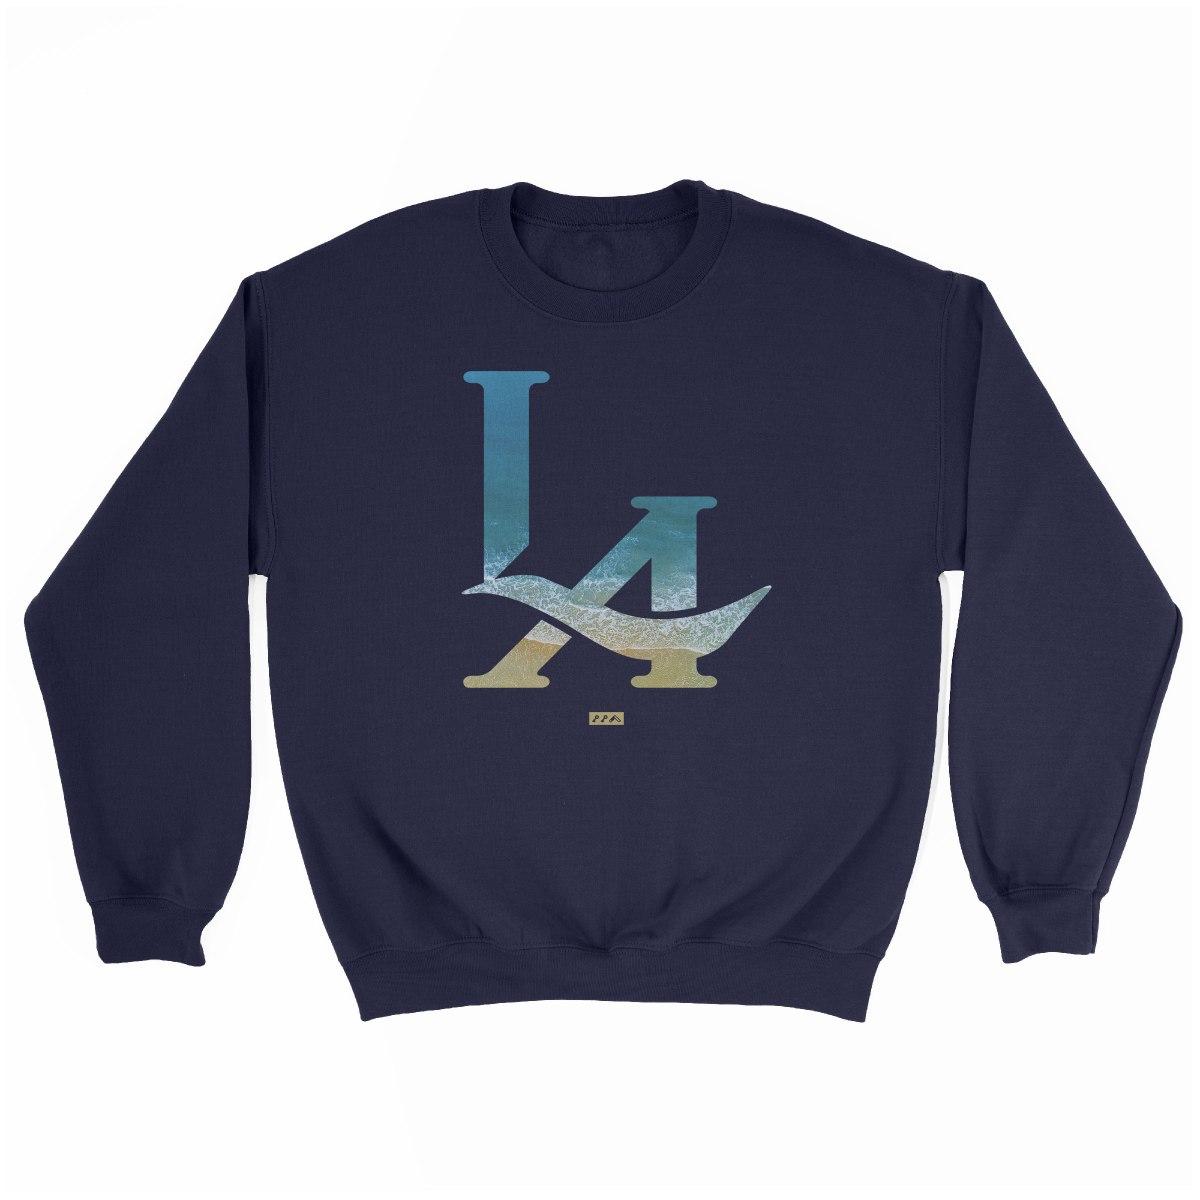 LA logo los angeles hermosa beach sweatshirt in navy at kikicutt.com